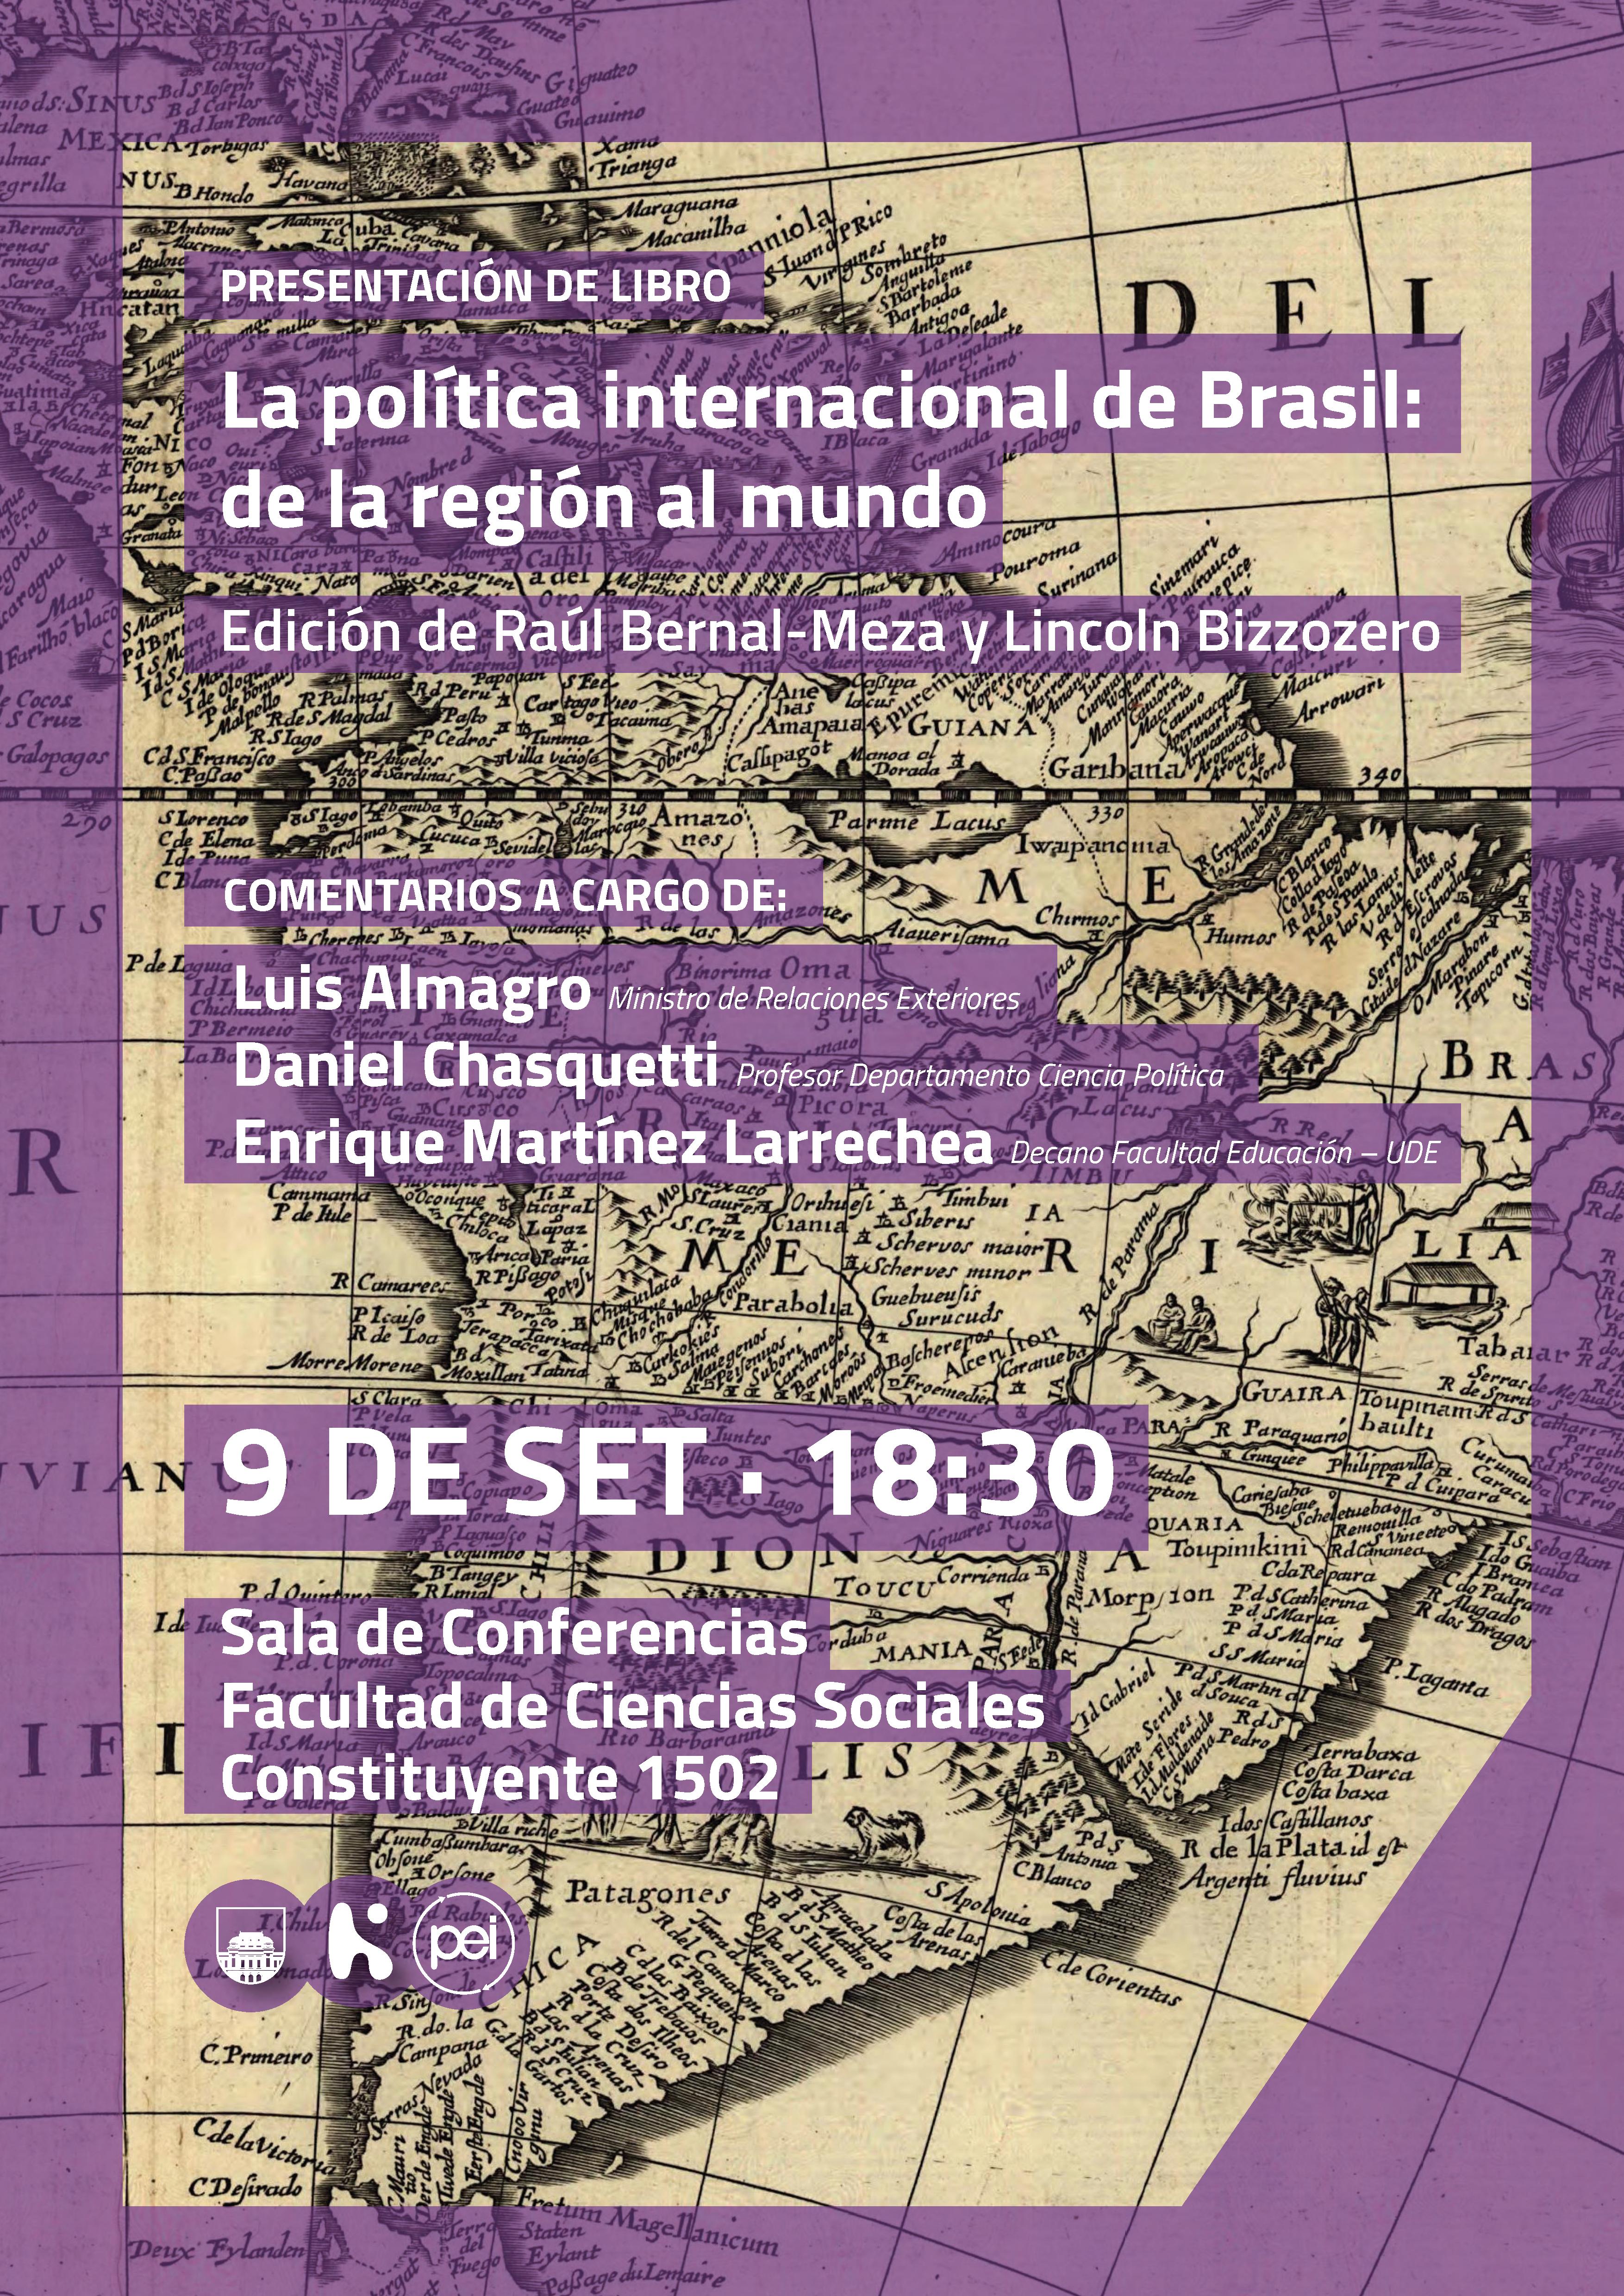 Invitacion Libro Política Internacional de Brasil